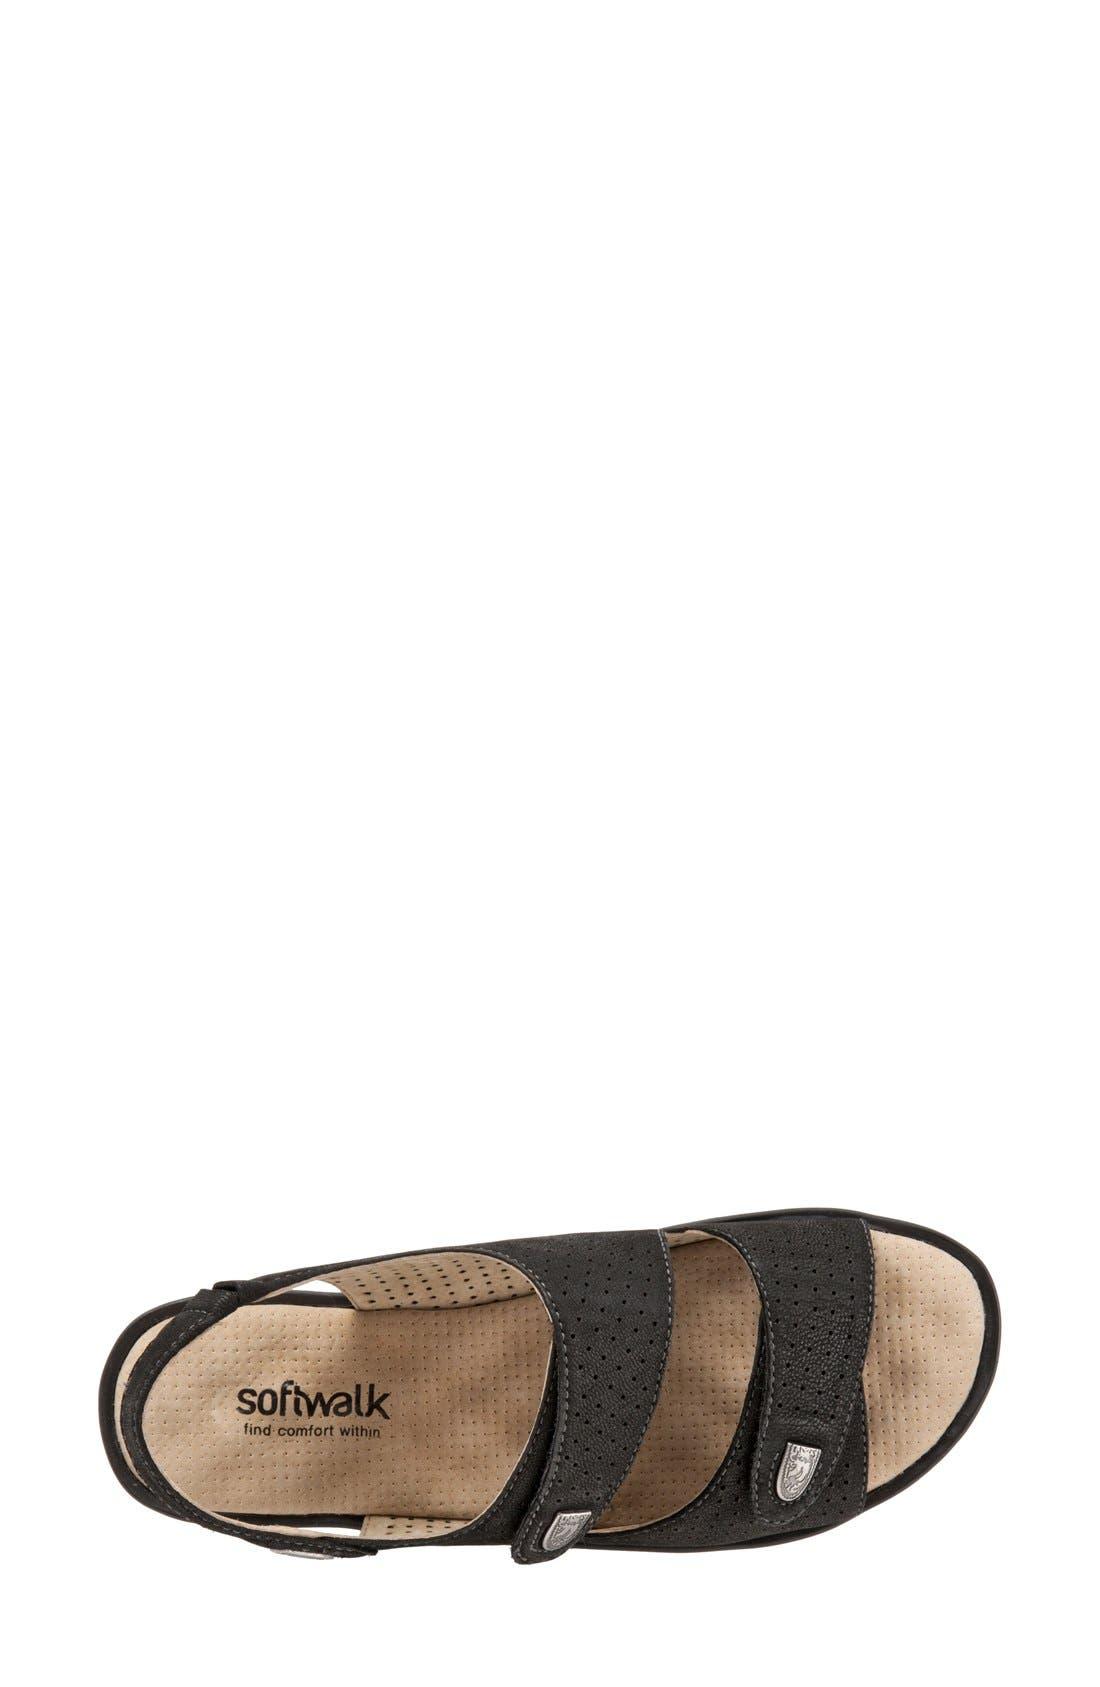 'Bolivia' Sandal,                             Alternate thumbnail 3, color,                             Black Perforated Leather